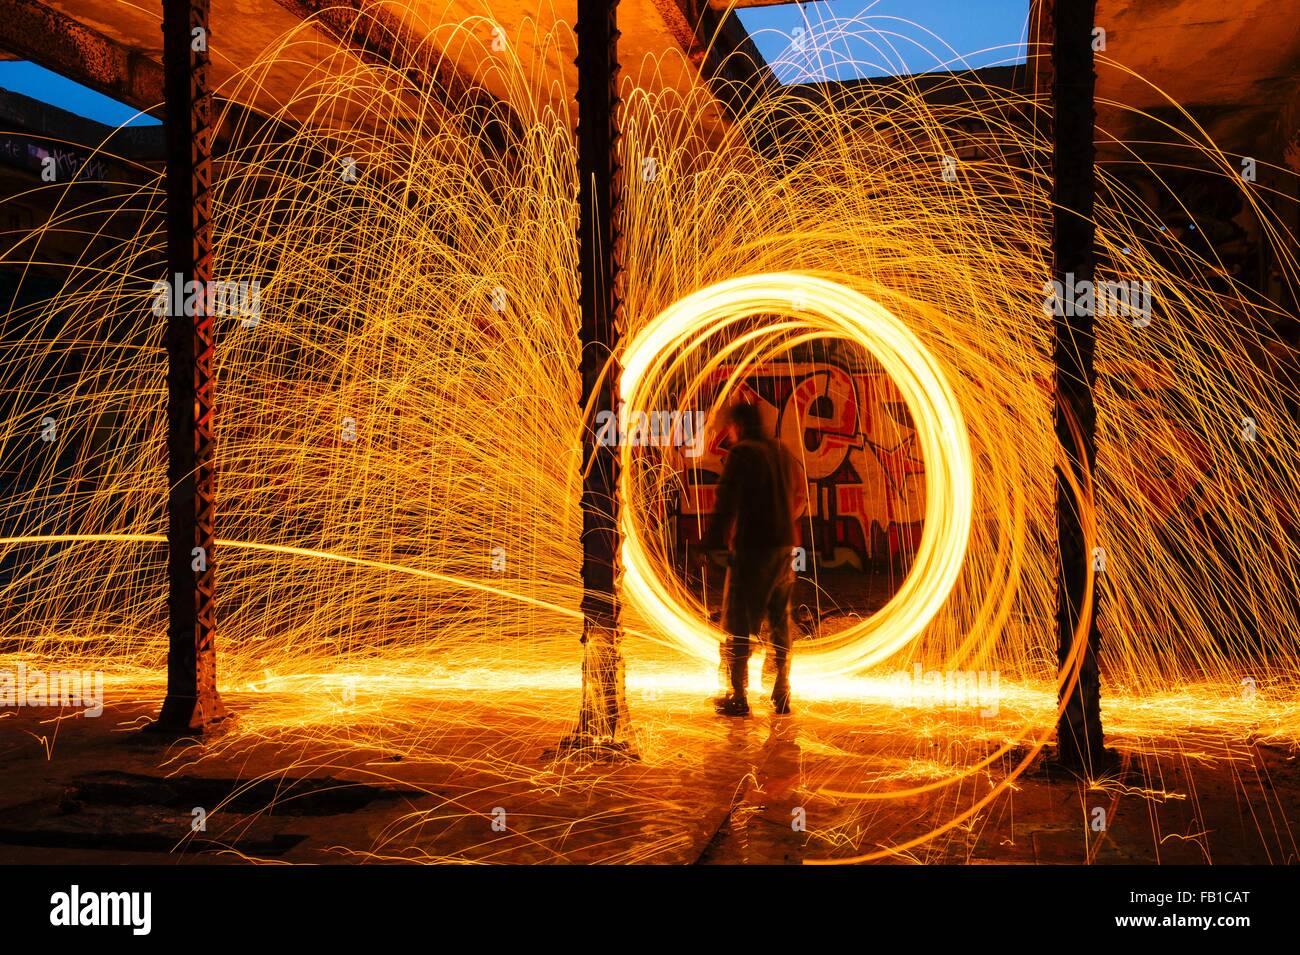 Man creating circular golden spark light trails in derelict building - Stock Image